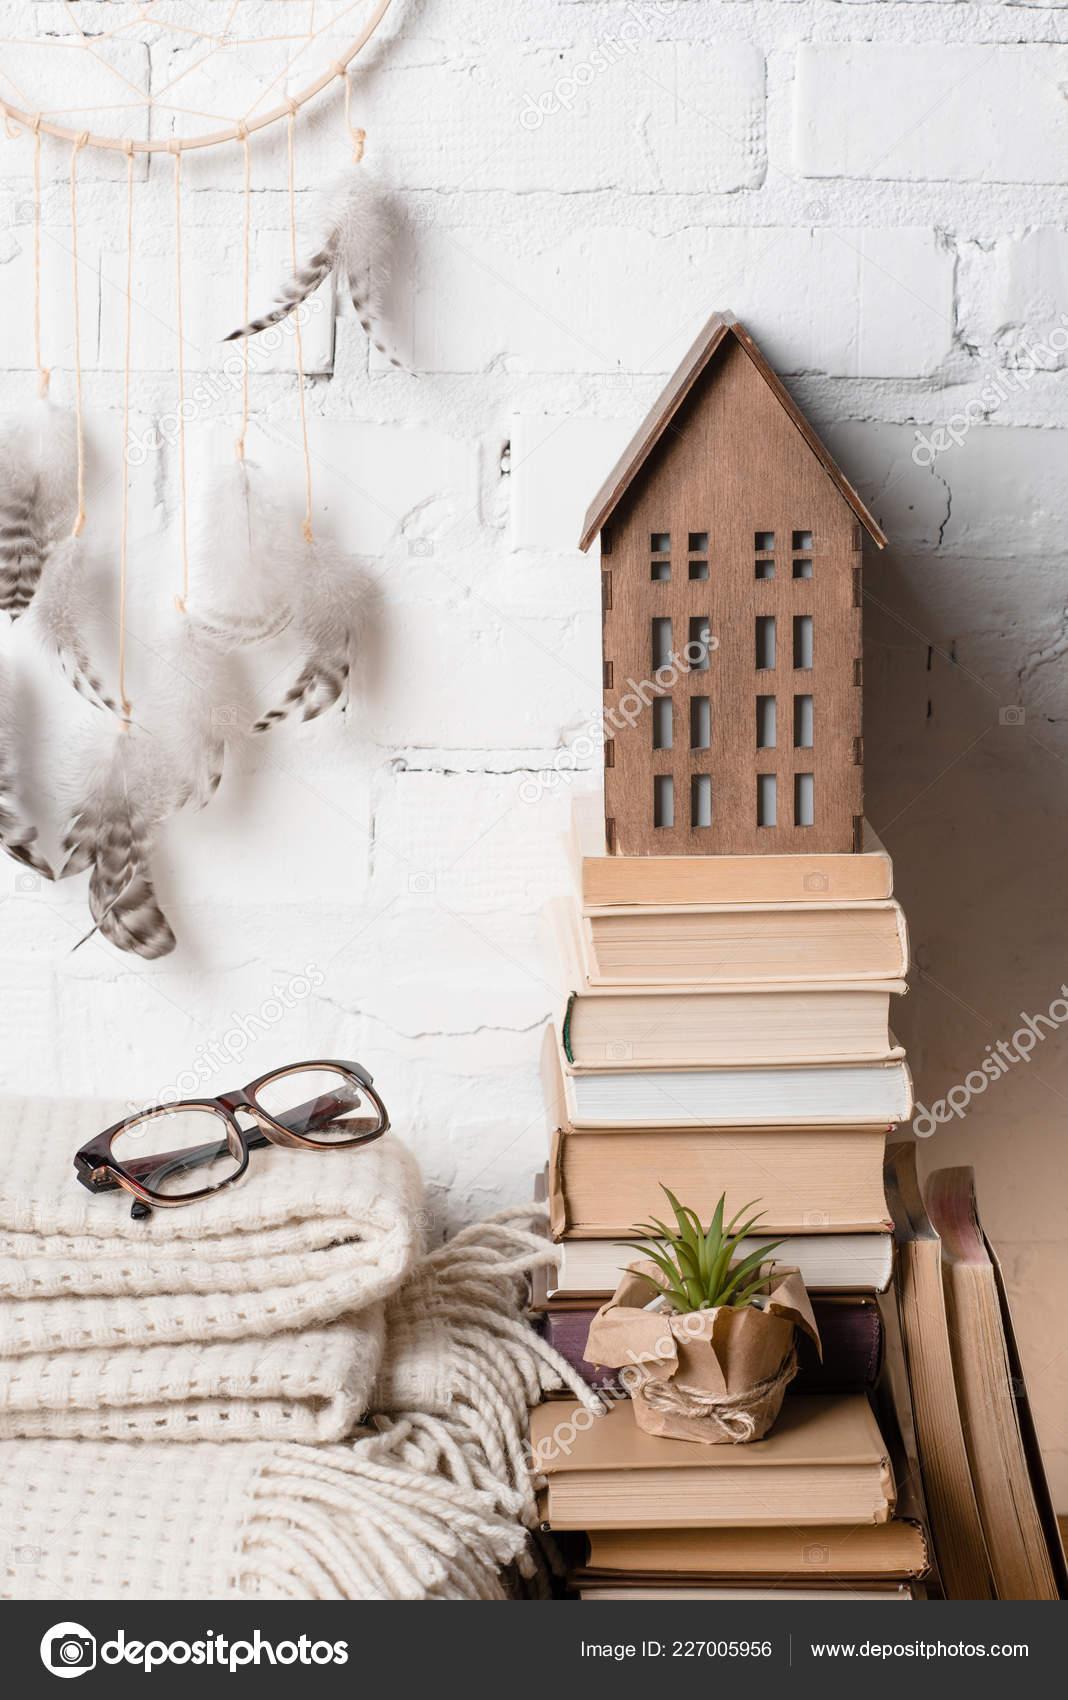 16c31e16b6 Βιβλία Όνειρο Catcher Γυαλιά Και Διακοσμητικό Ξύλινο Σπίτι Κοντά Λευκό–  εικόνα αρχείου